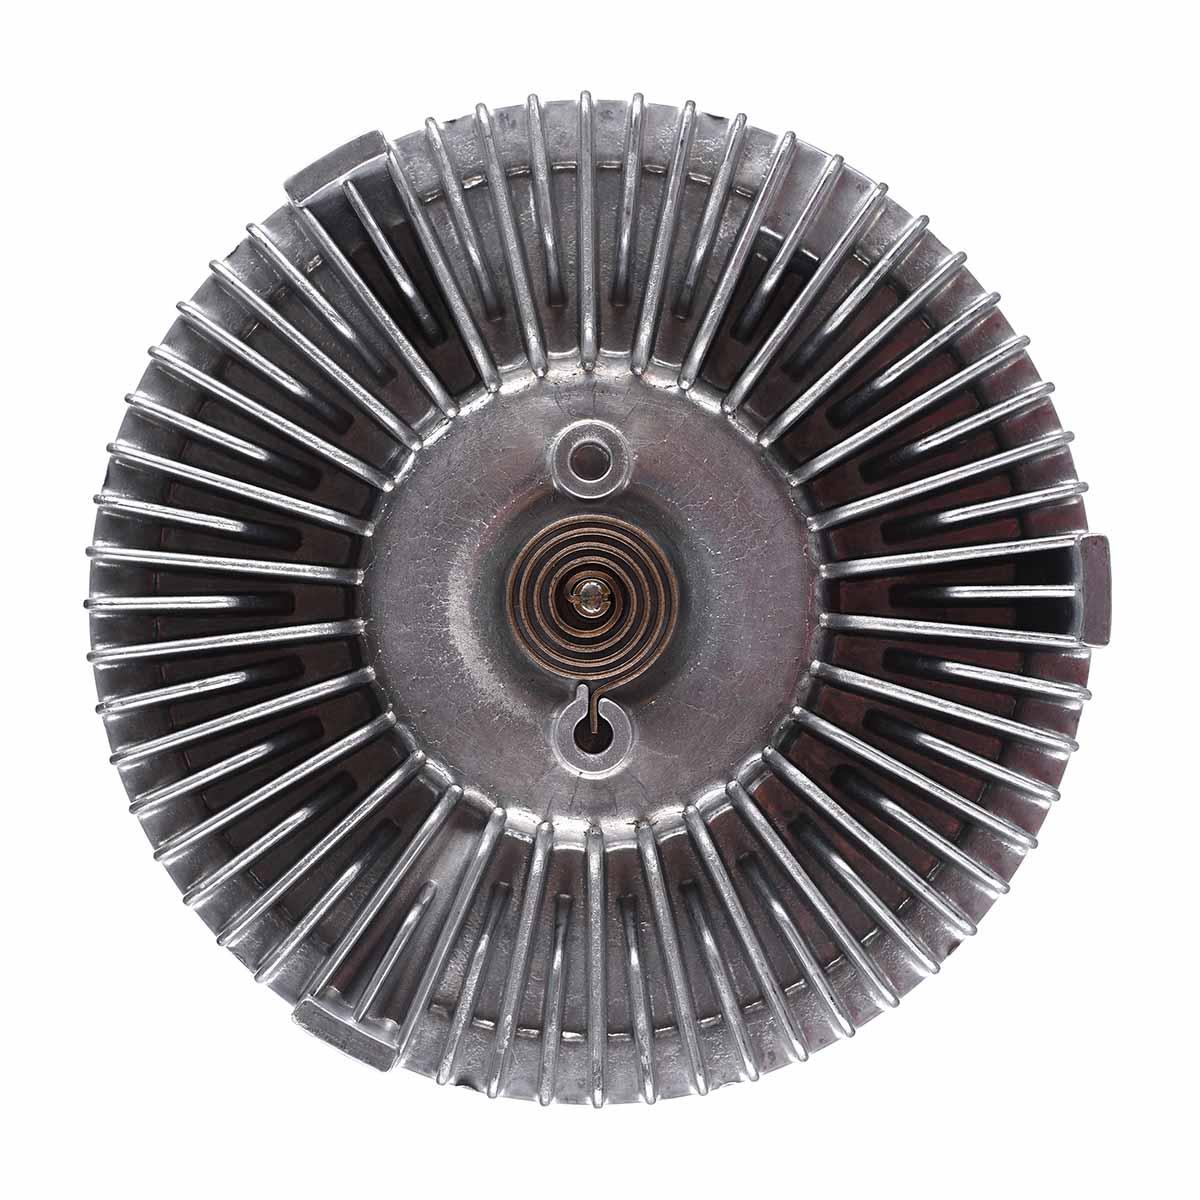 medium resolution of cooling fan clutch for cadillac escalade chevrolet gmc yukon savana sierrac k 1500 oldsmobile hummer h2 4 3 4 8l 5 3l 5 7l 6 0l in fans kits from